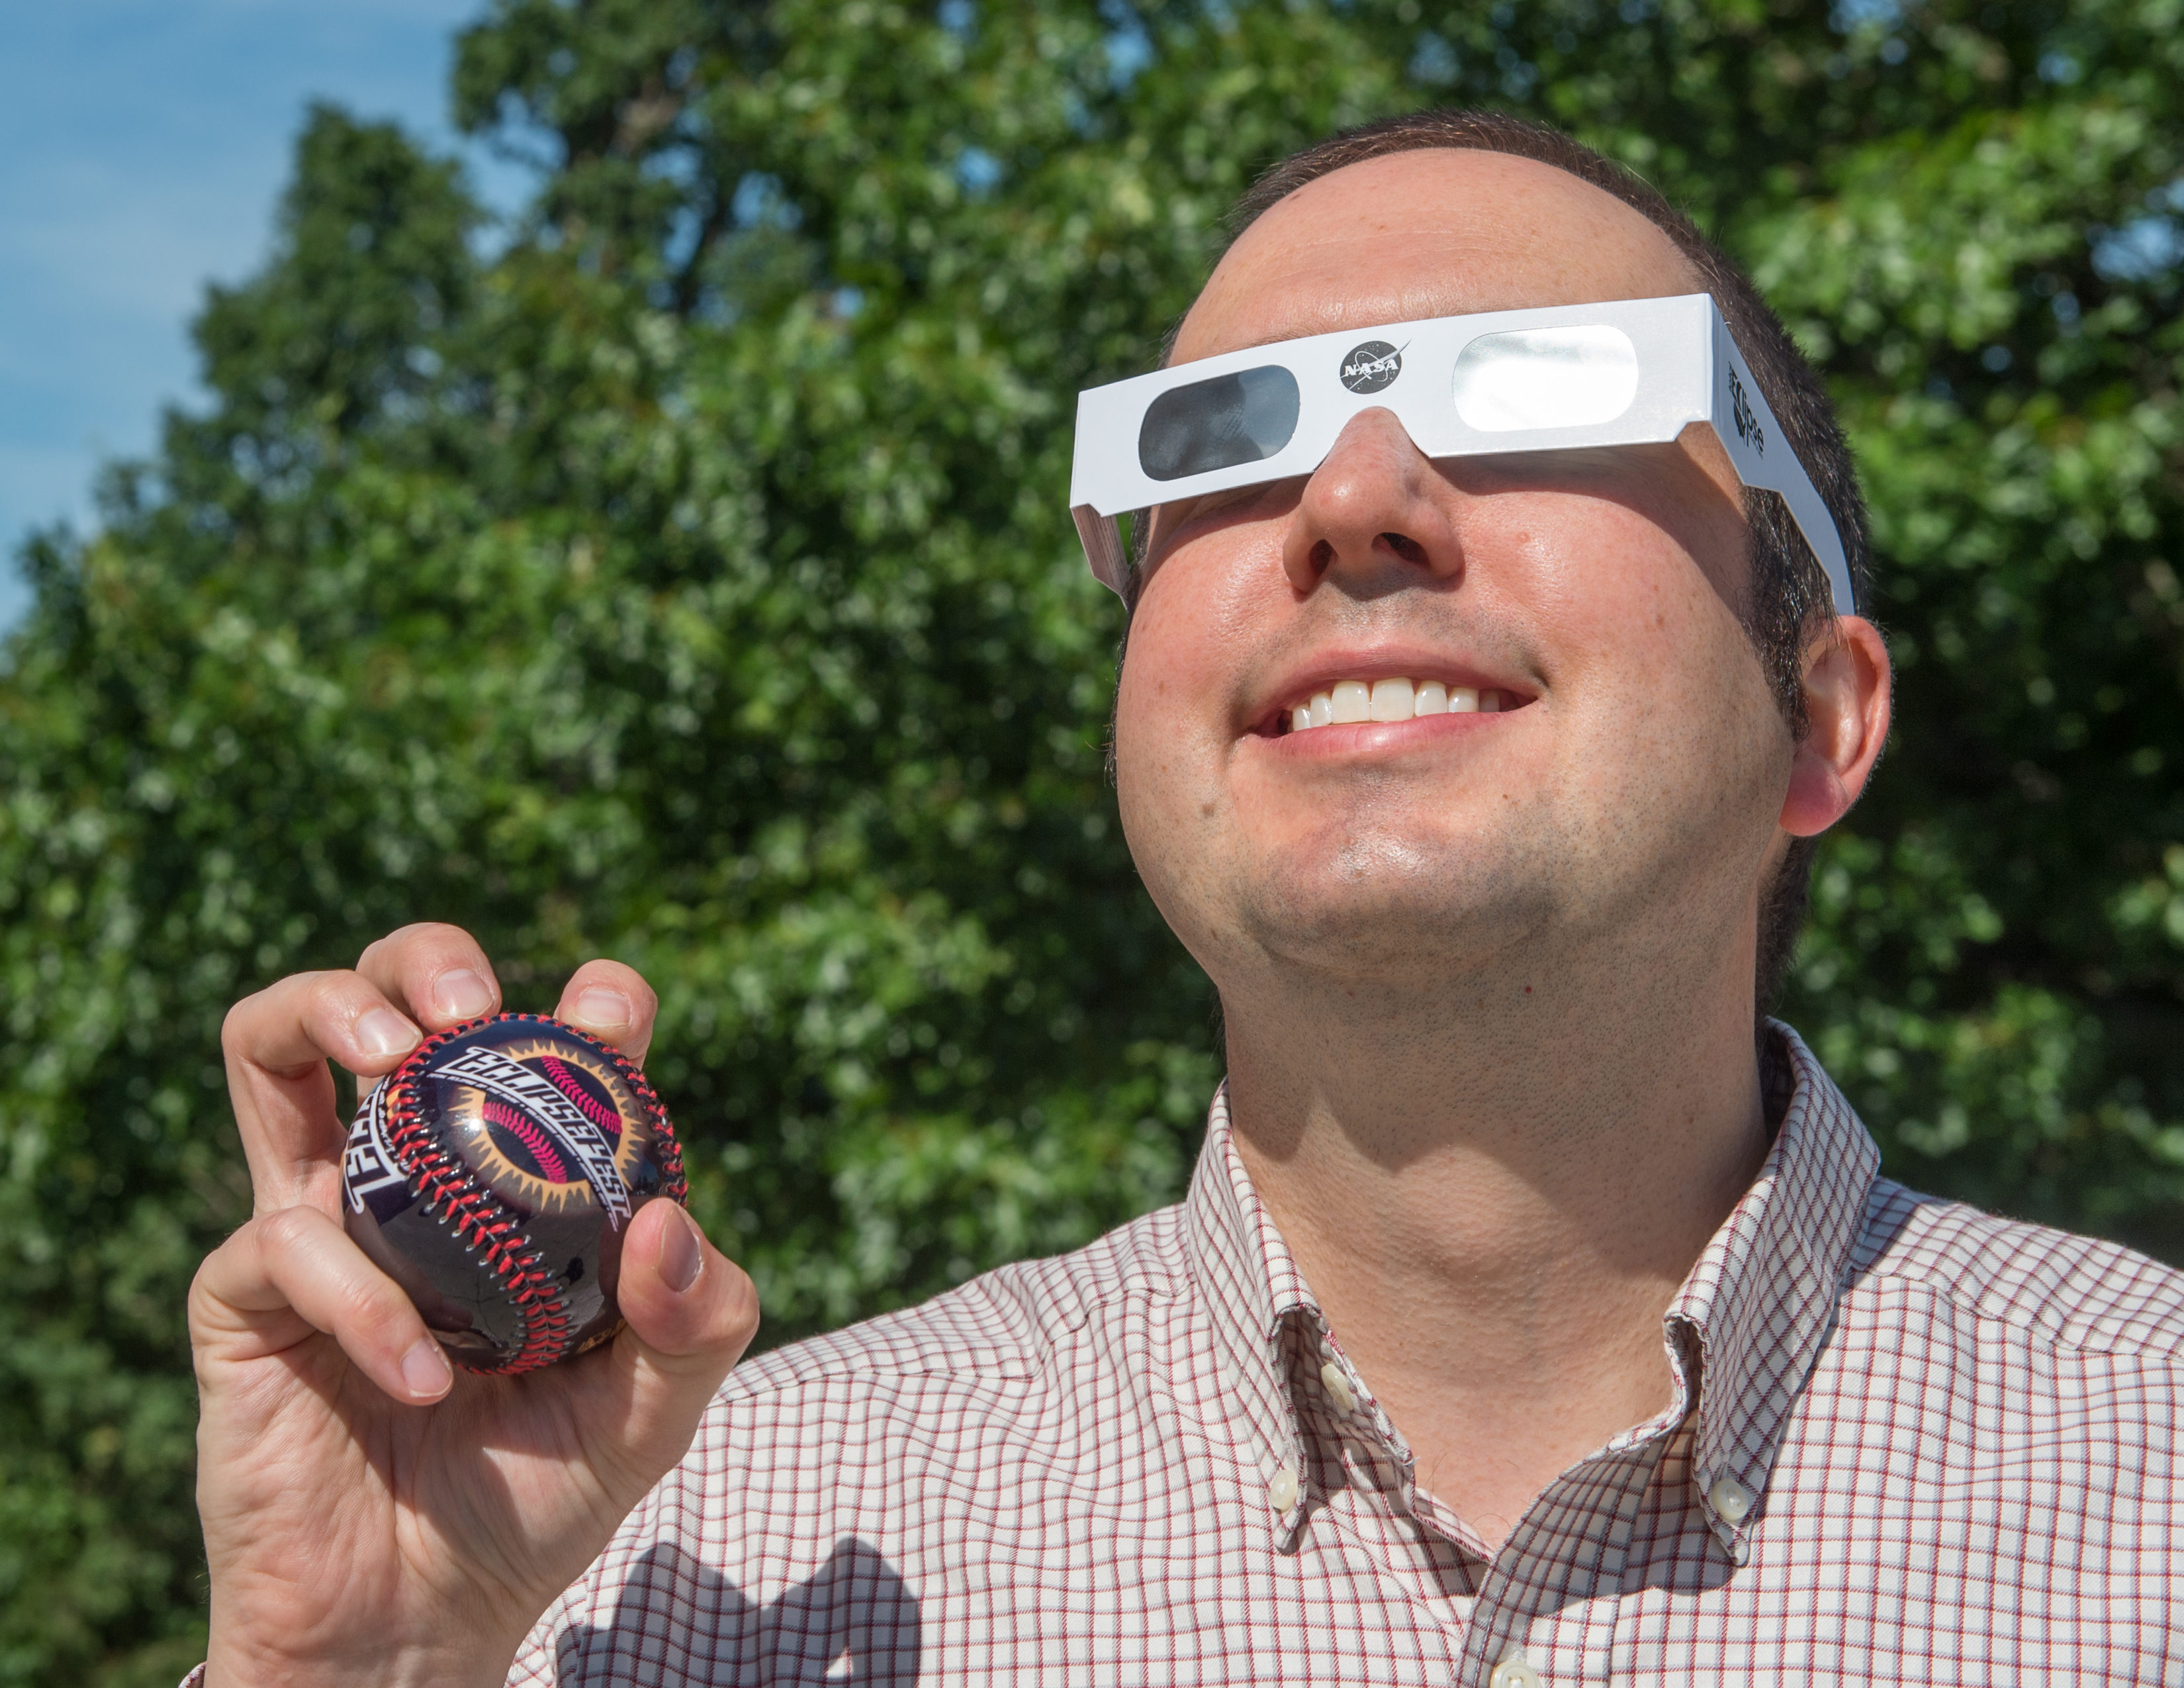 Solar Eclipse Knocks Nasa Goddard Into The Park Nasa